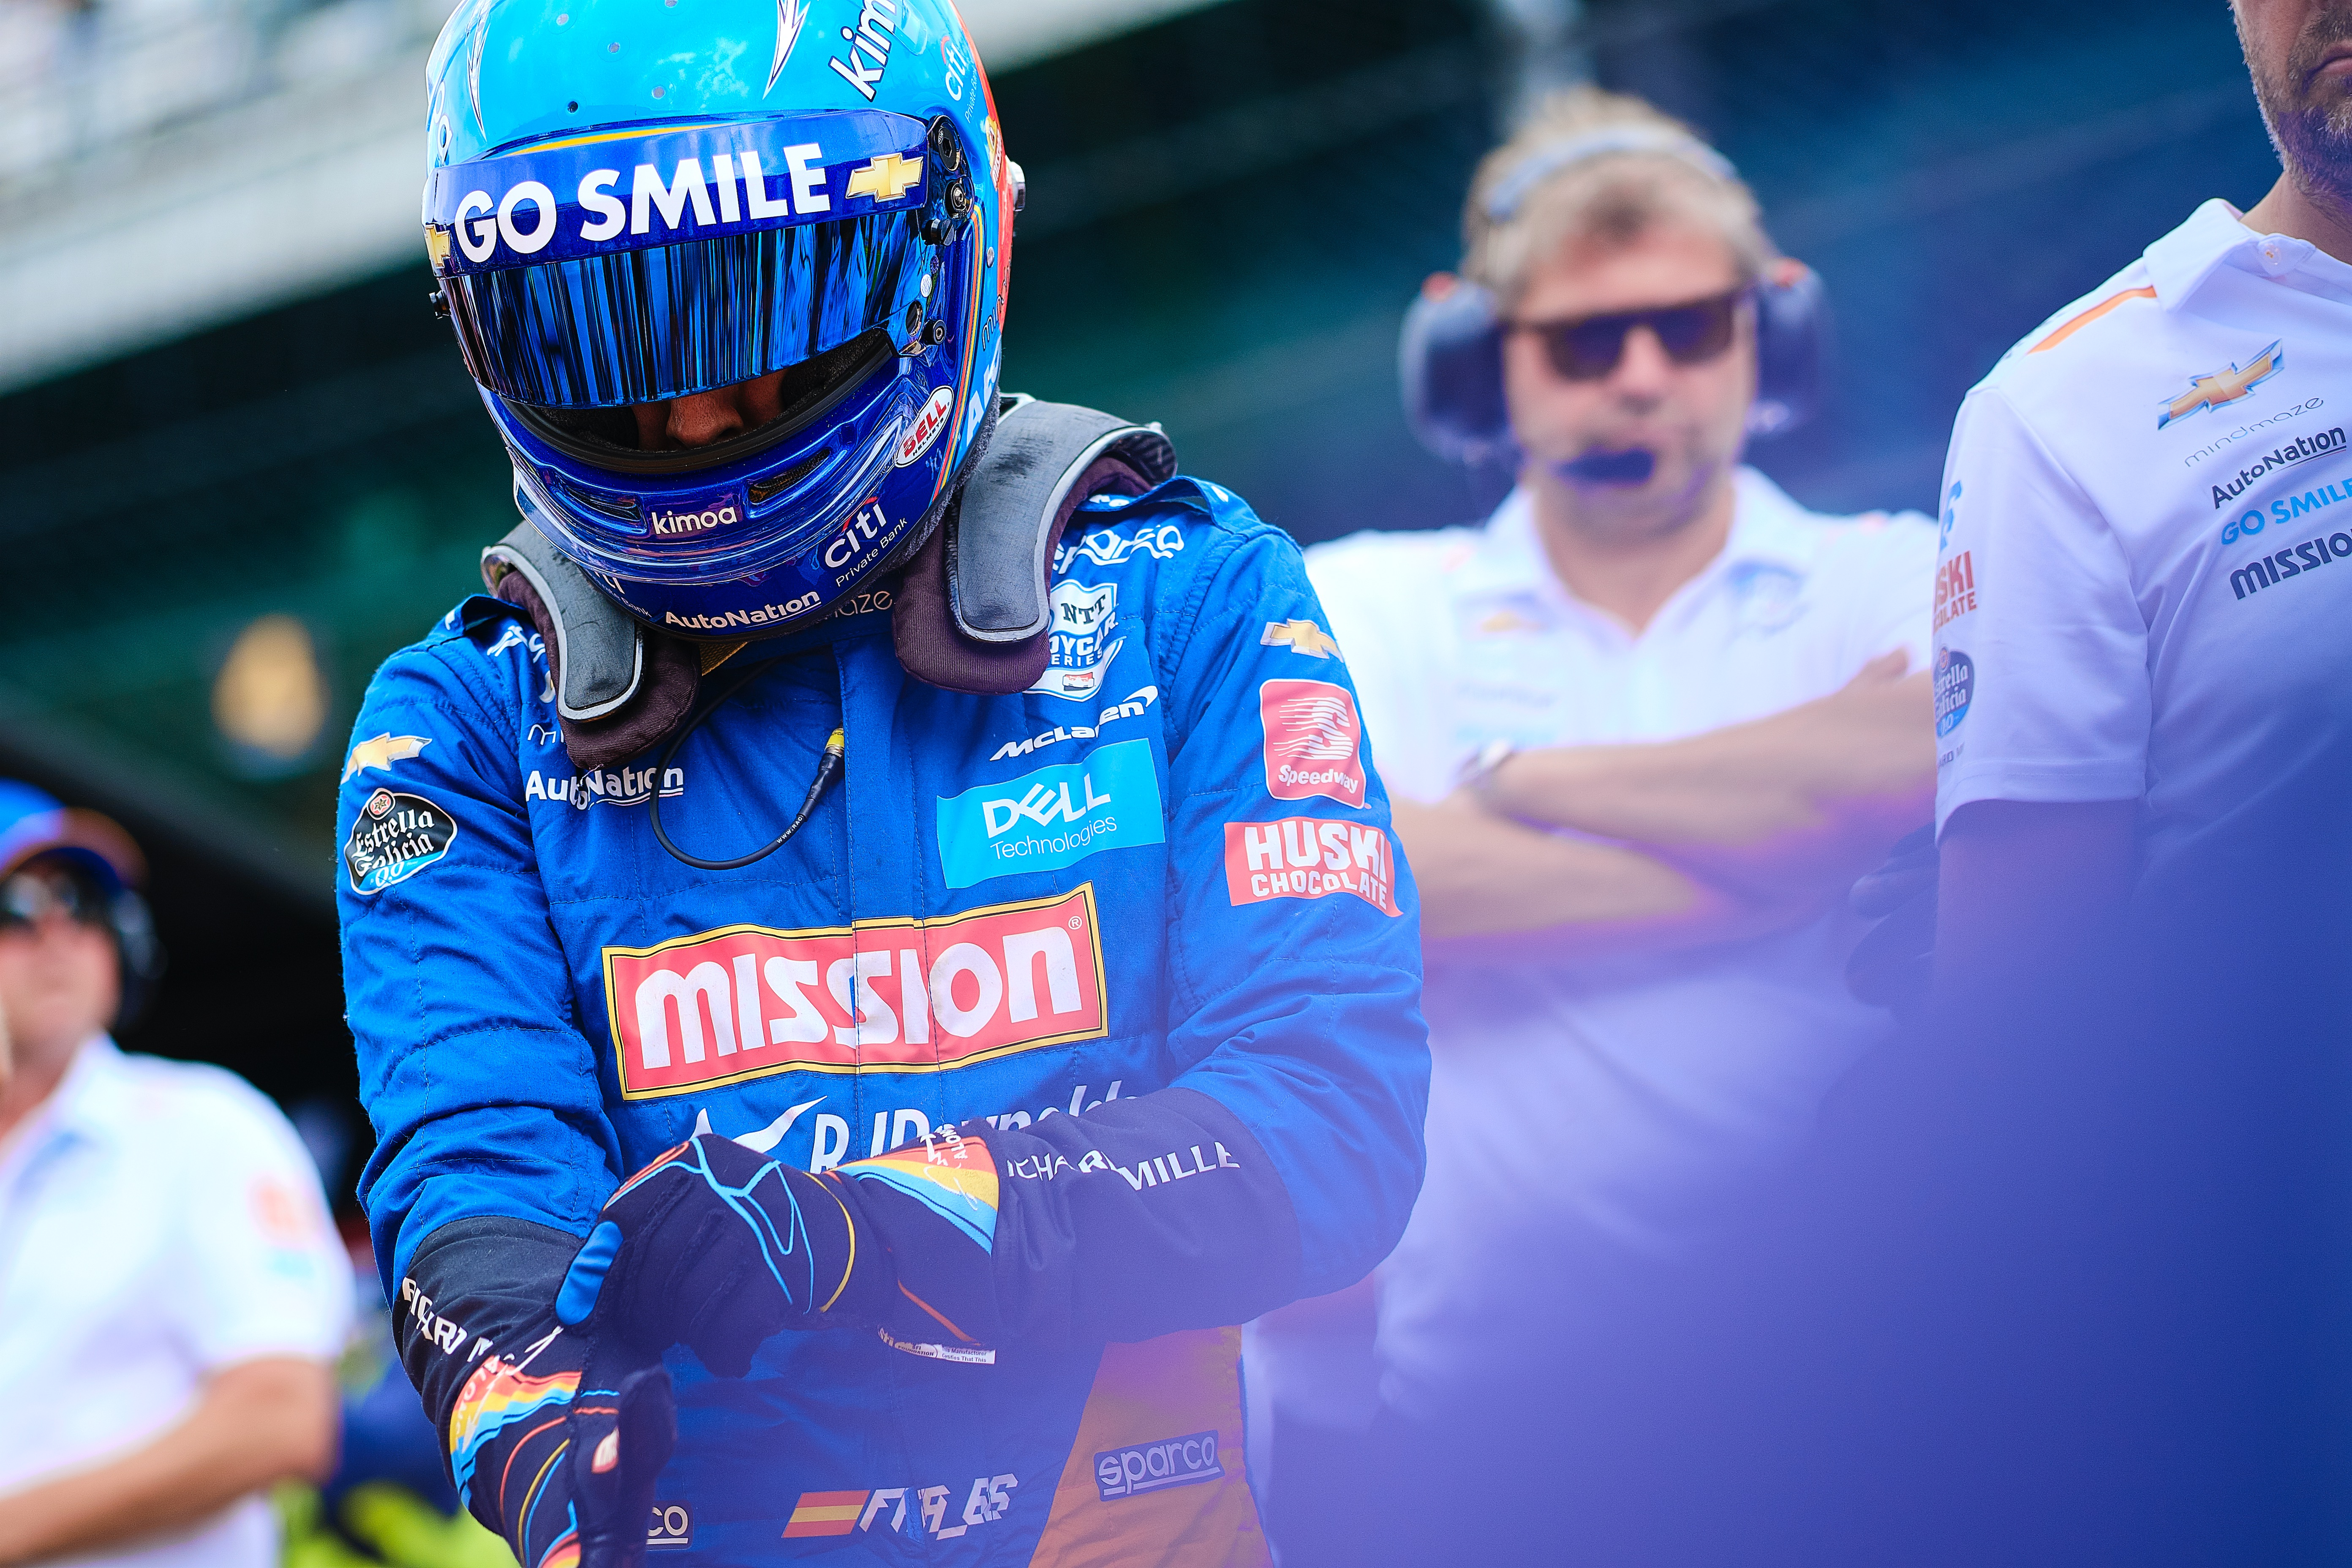 Fernando Alonso McLaren IndyCar 2019